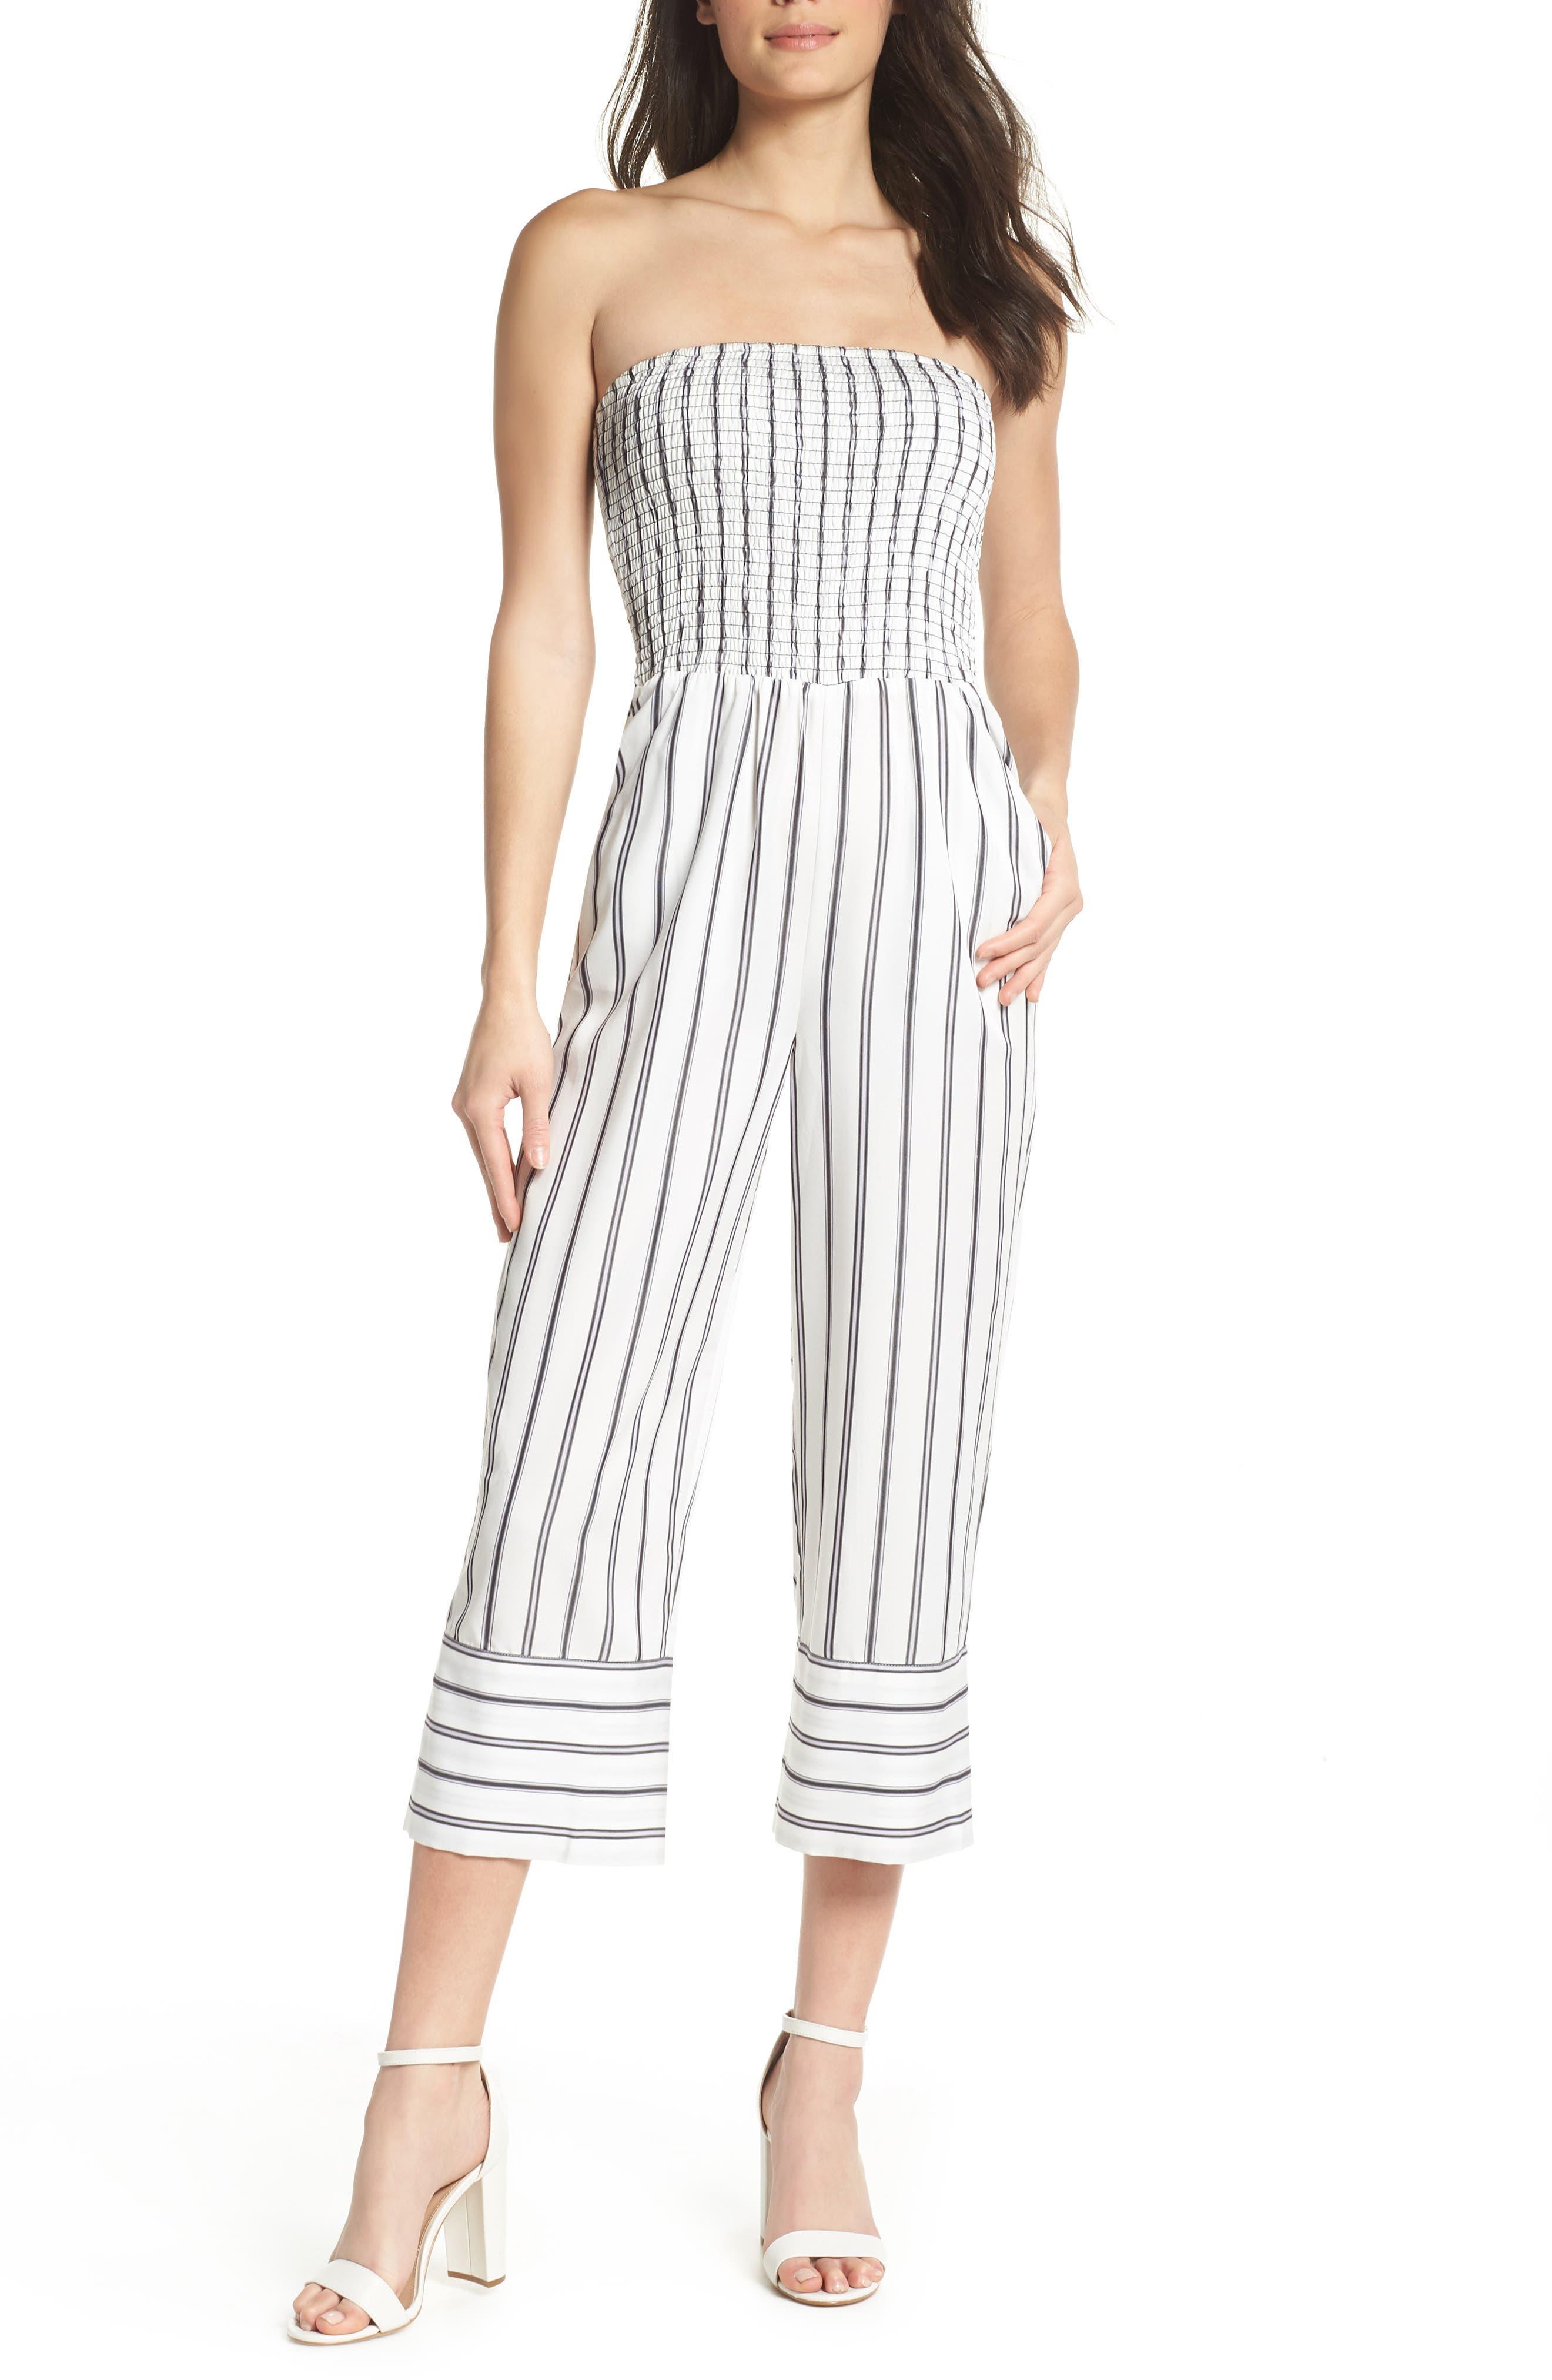 Get in the Grove Stripe Strapless Jumpsuit,                         Main,                         color, Black/ White Uneven Stripe